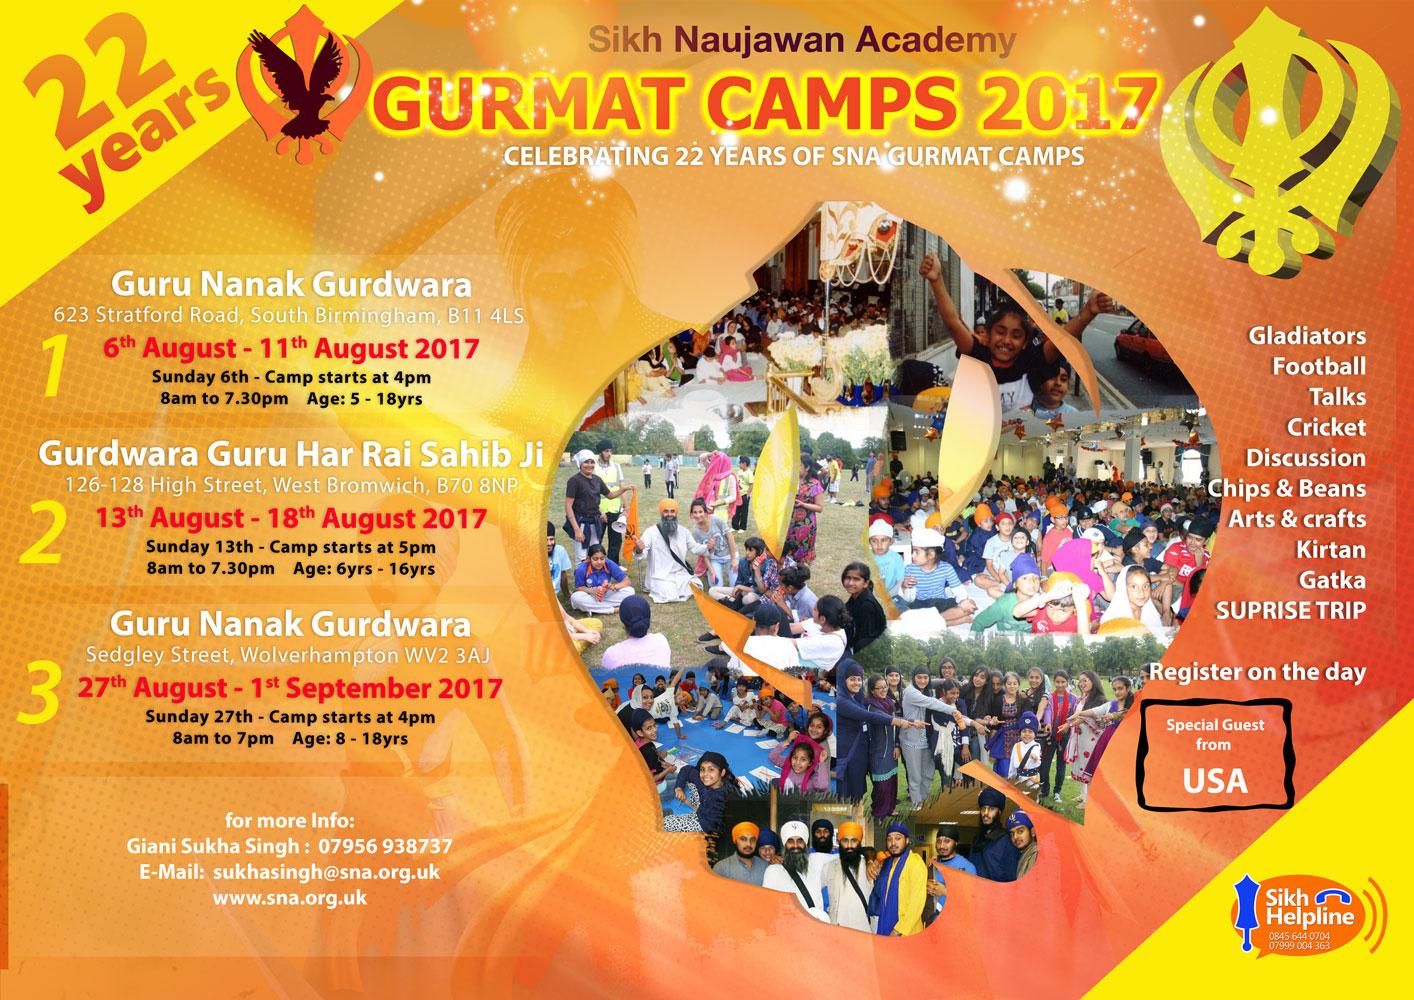 SNA Gurmat Camp 2017